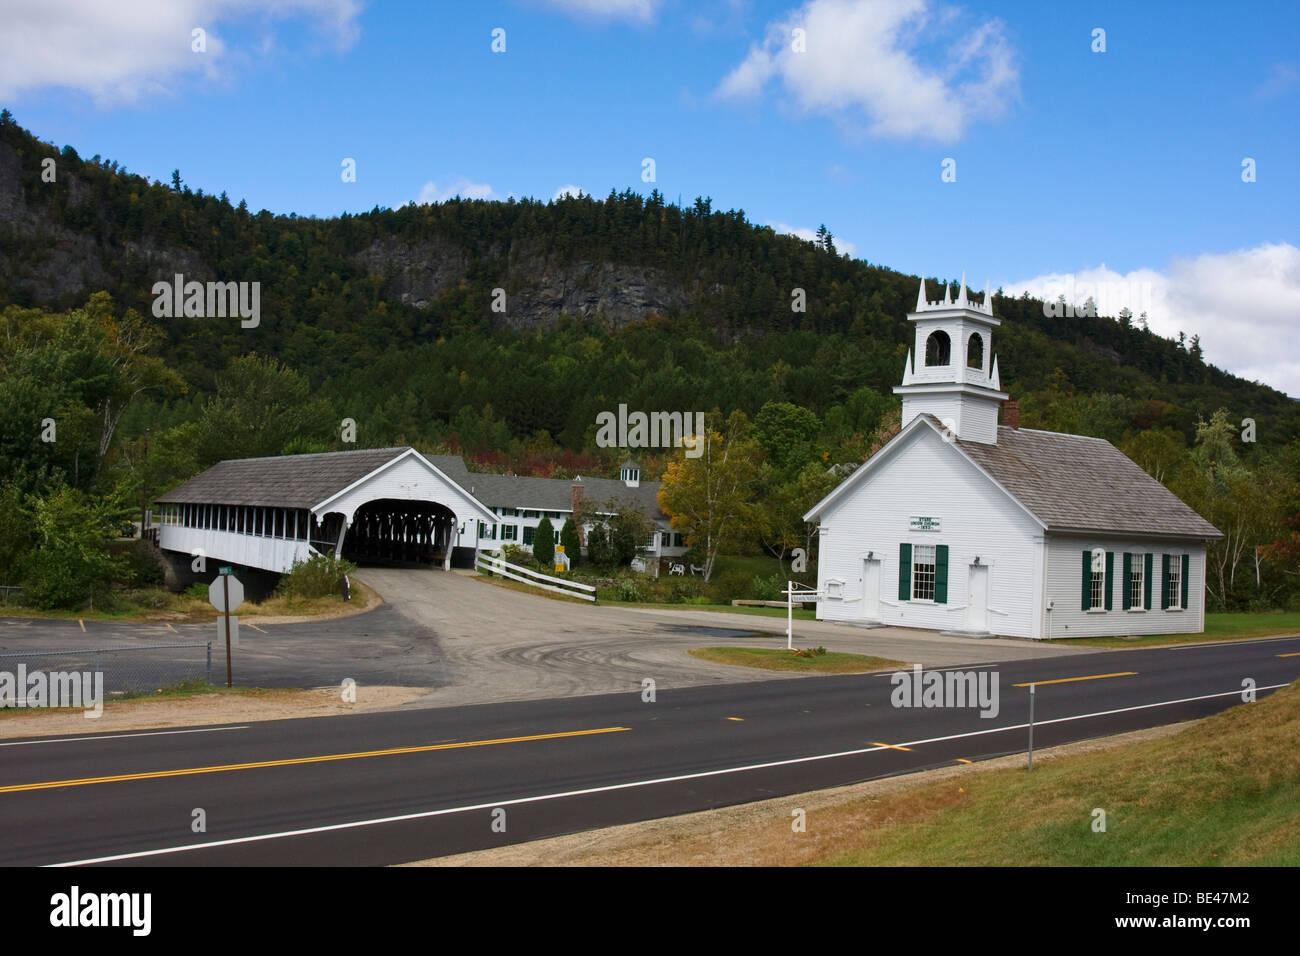 Stark Union Church, Stark, New Hampshire - Stock Image